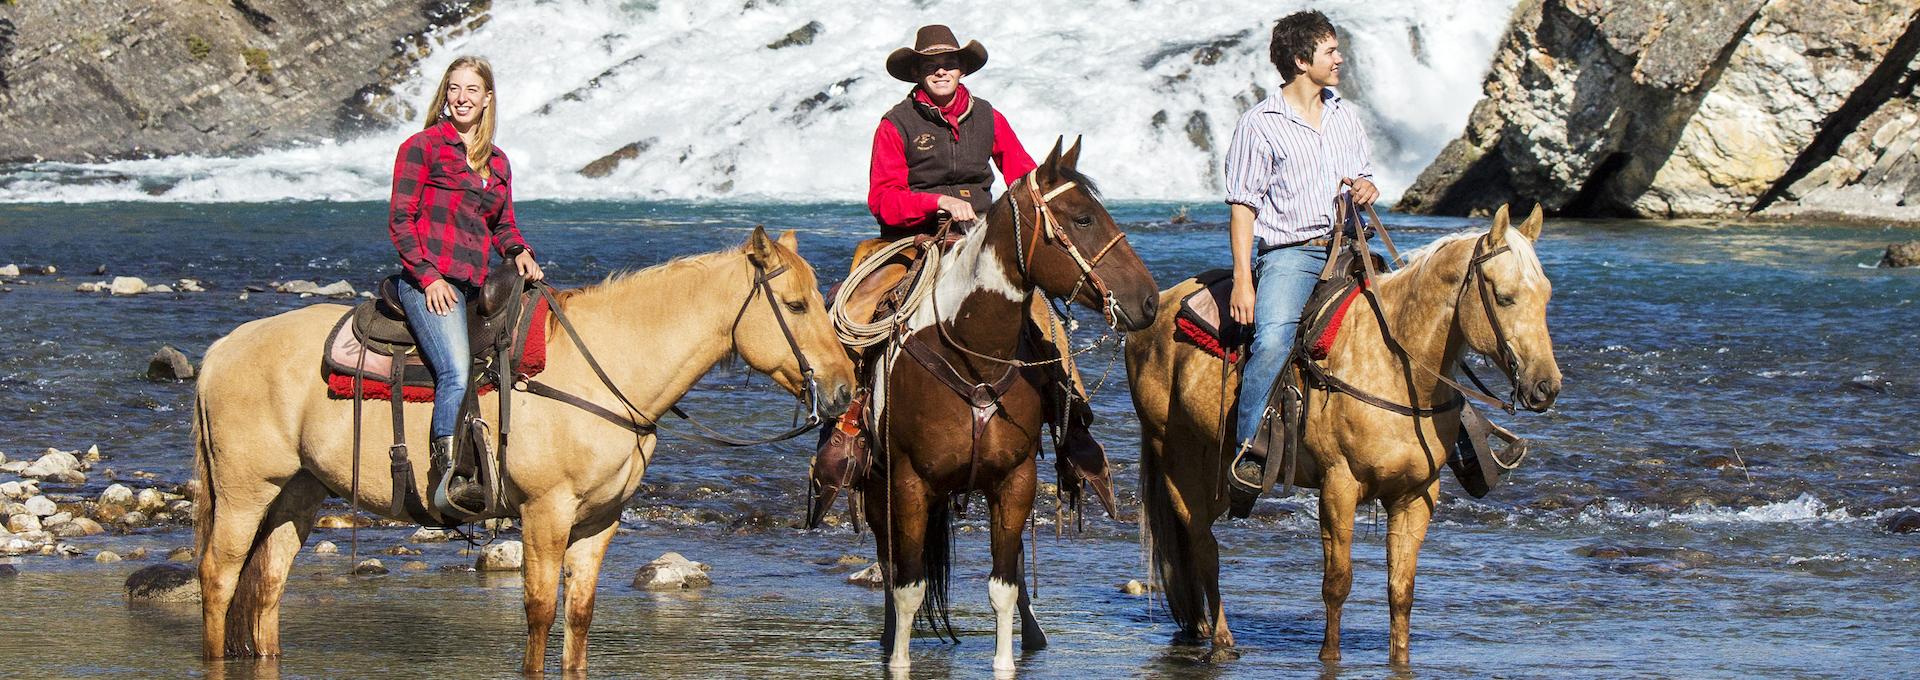 Banff Bow River Horseback Ride